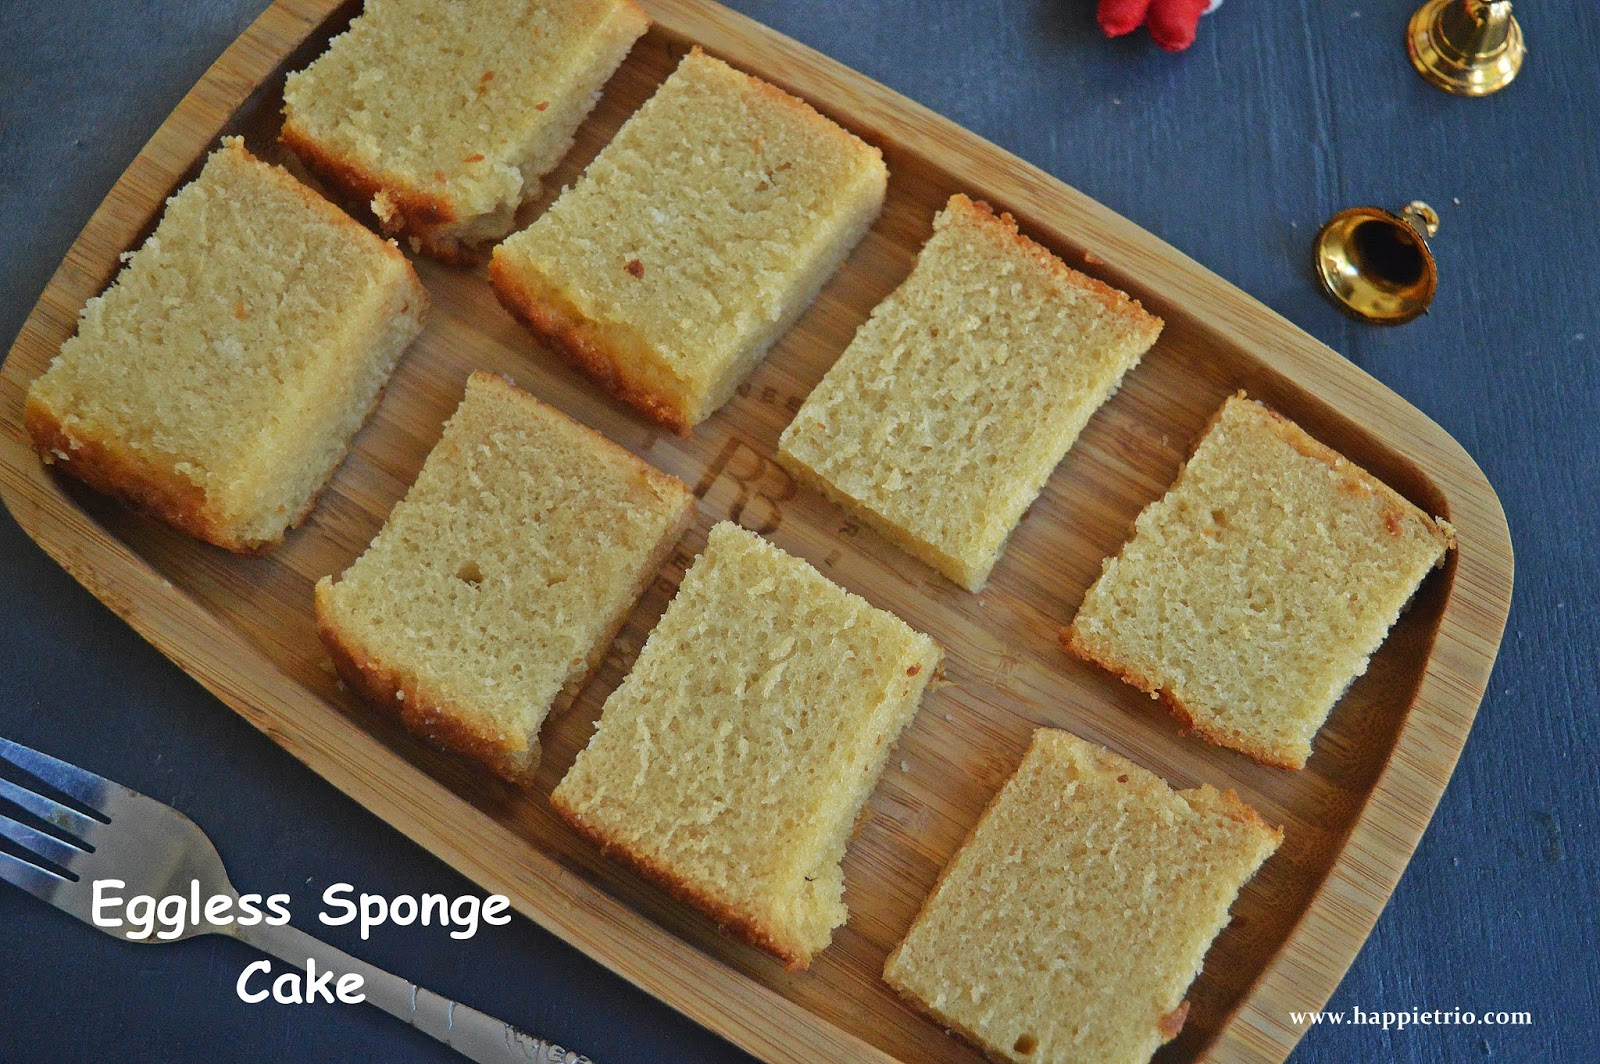 Eggless Vanilla Sponge Cake Recipe | Basic Sponge Cake Eggless Version